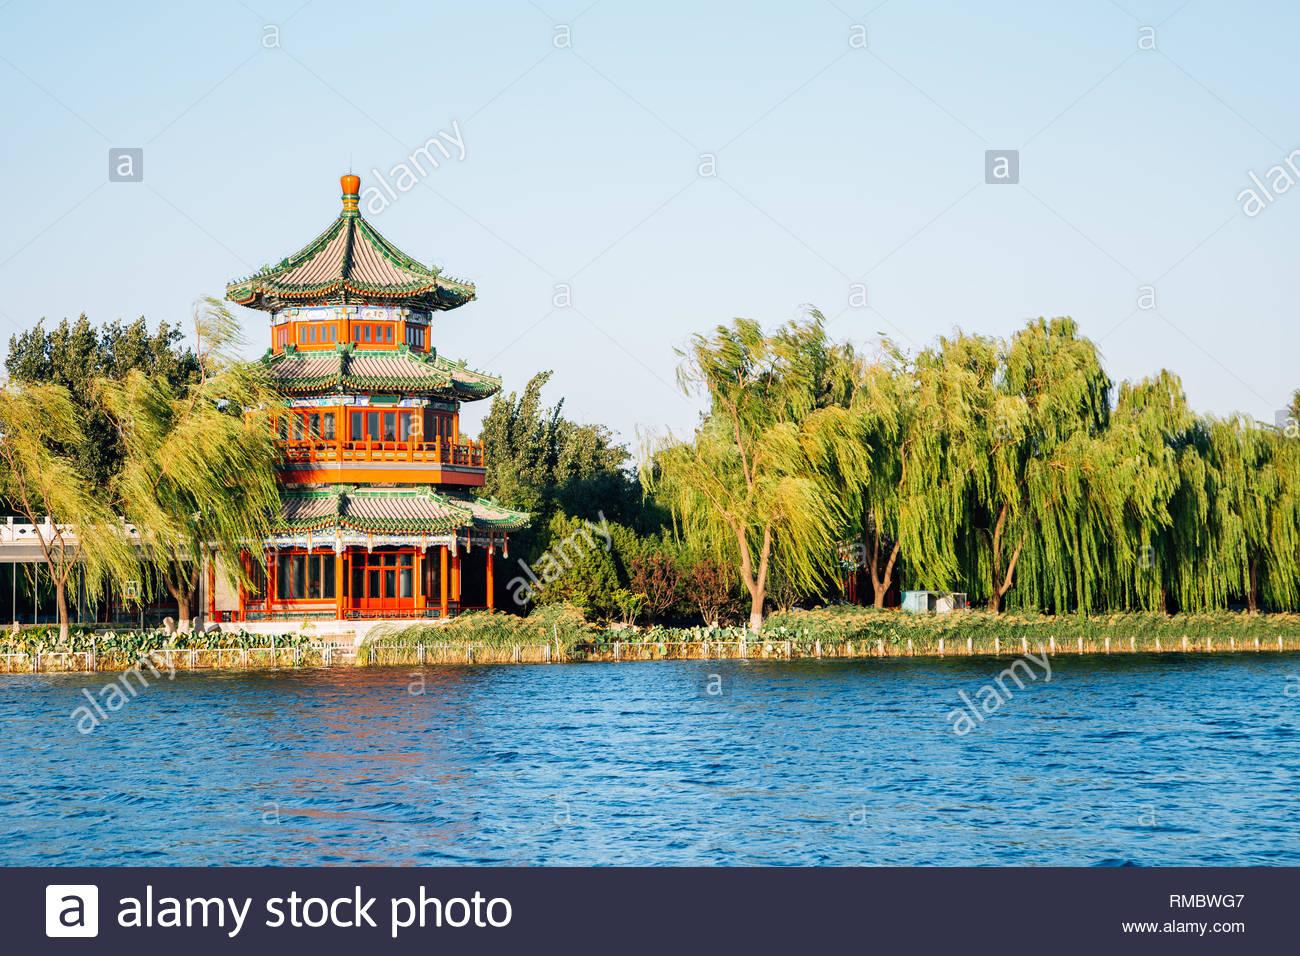 Shichahai Houhai lake and Chinese traditional pavilion in Beijing, China - Stock Image